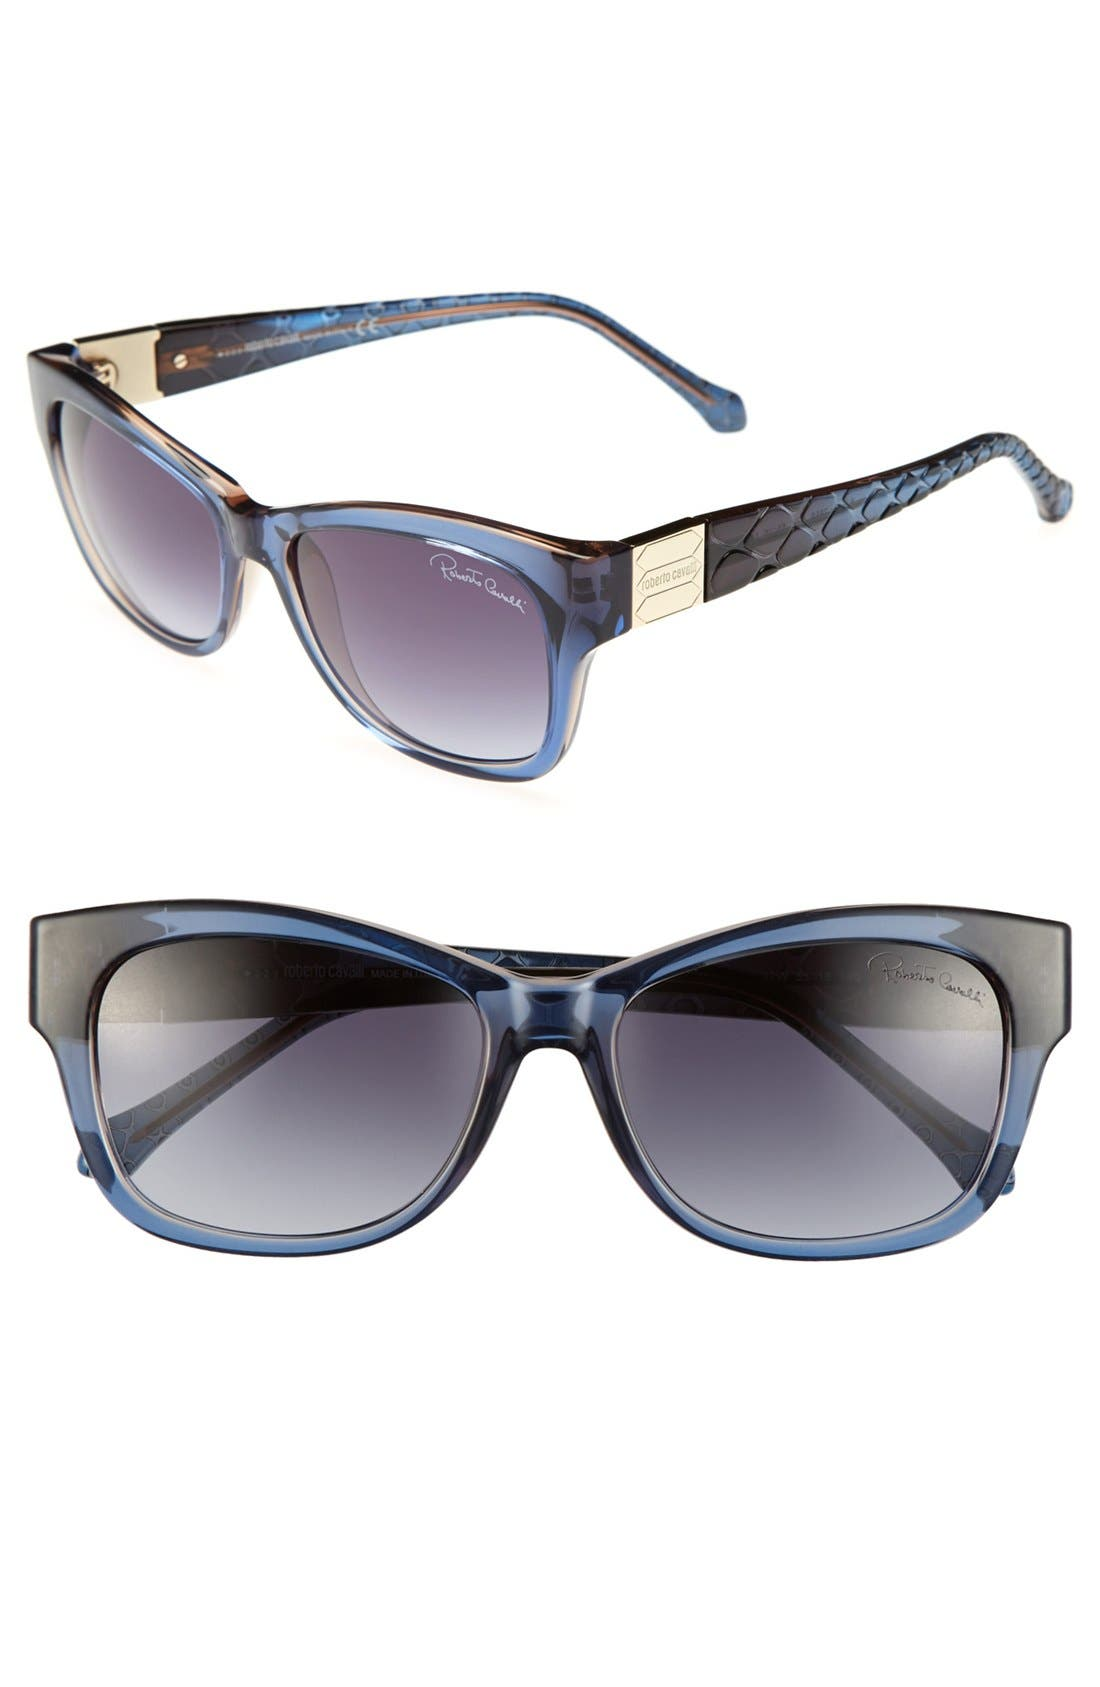 Alternate Image 1 Selected - Roberto Cavalli 'Acamar' 55mm Sunglasses